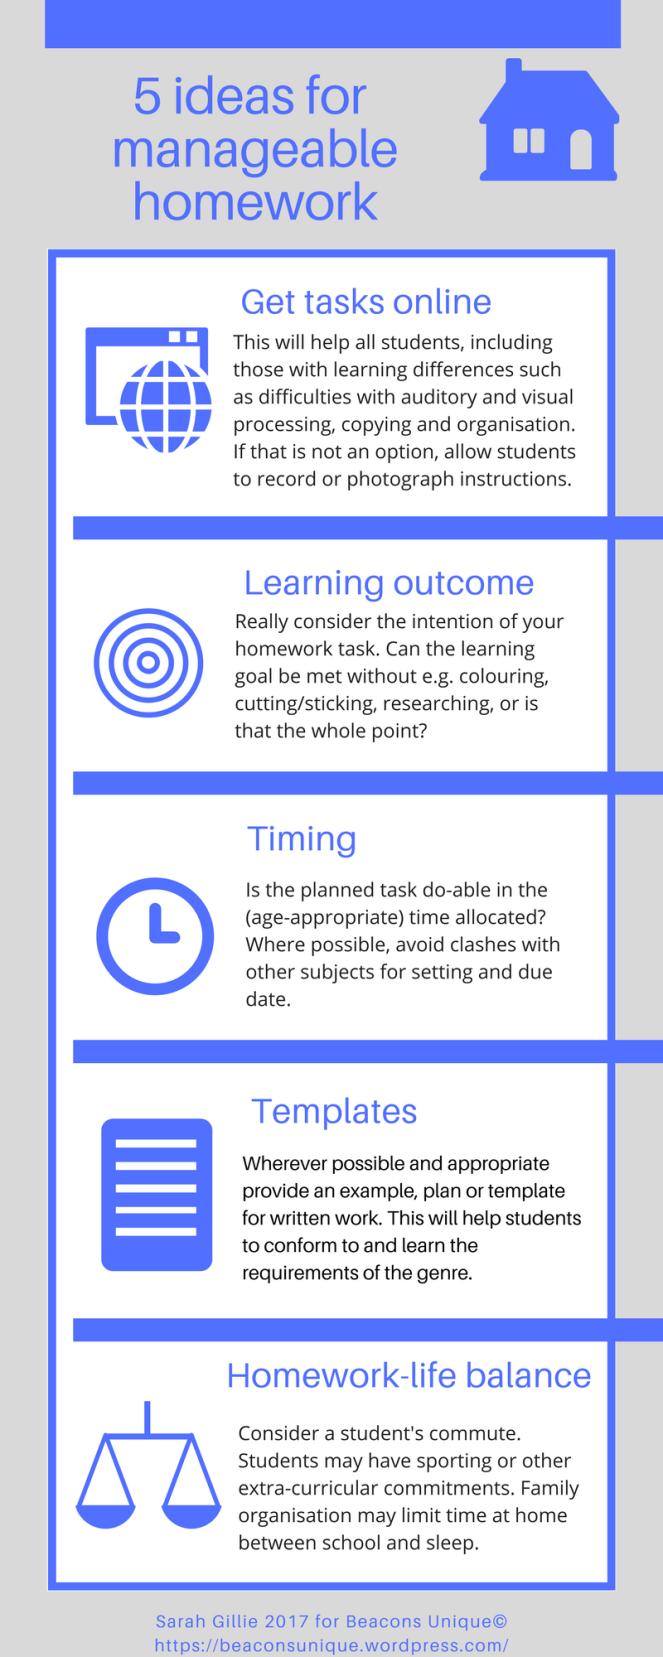 5 ideas to make homework work for you